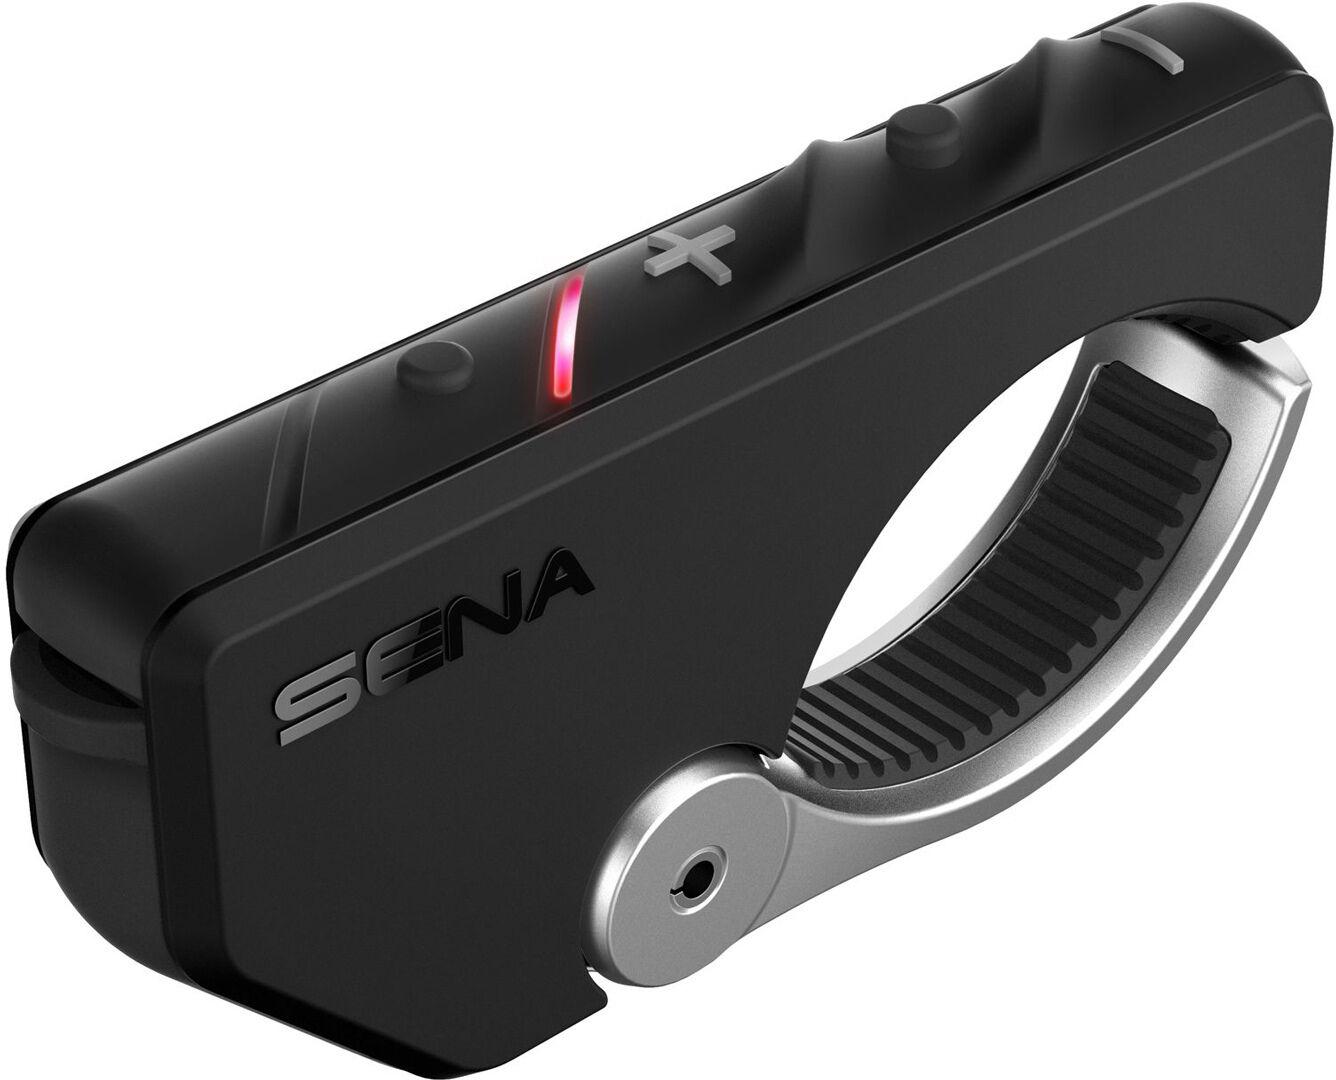 Sena RC4 Bluetooth Remote Control Negro un tamaño